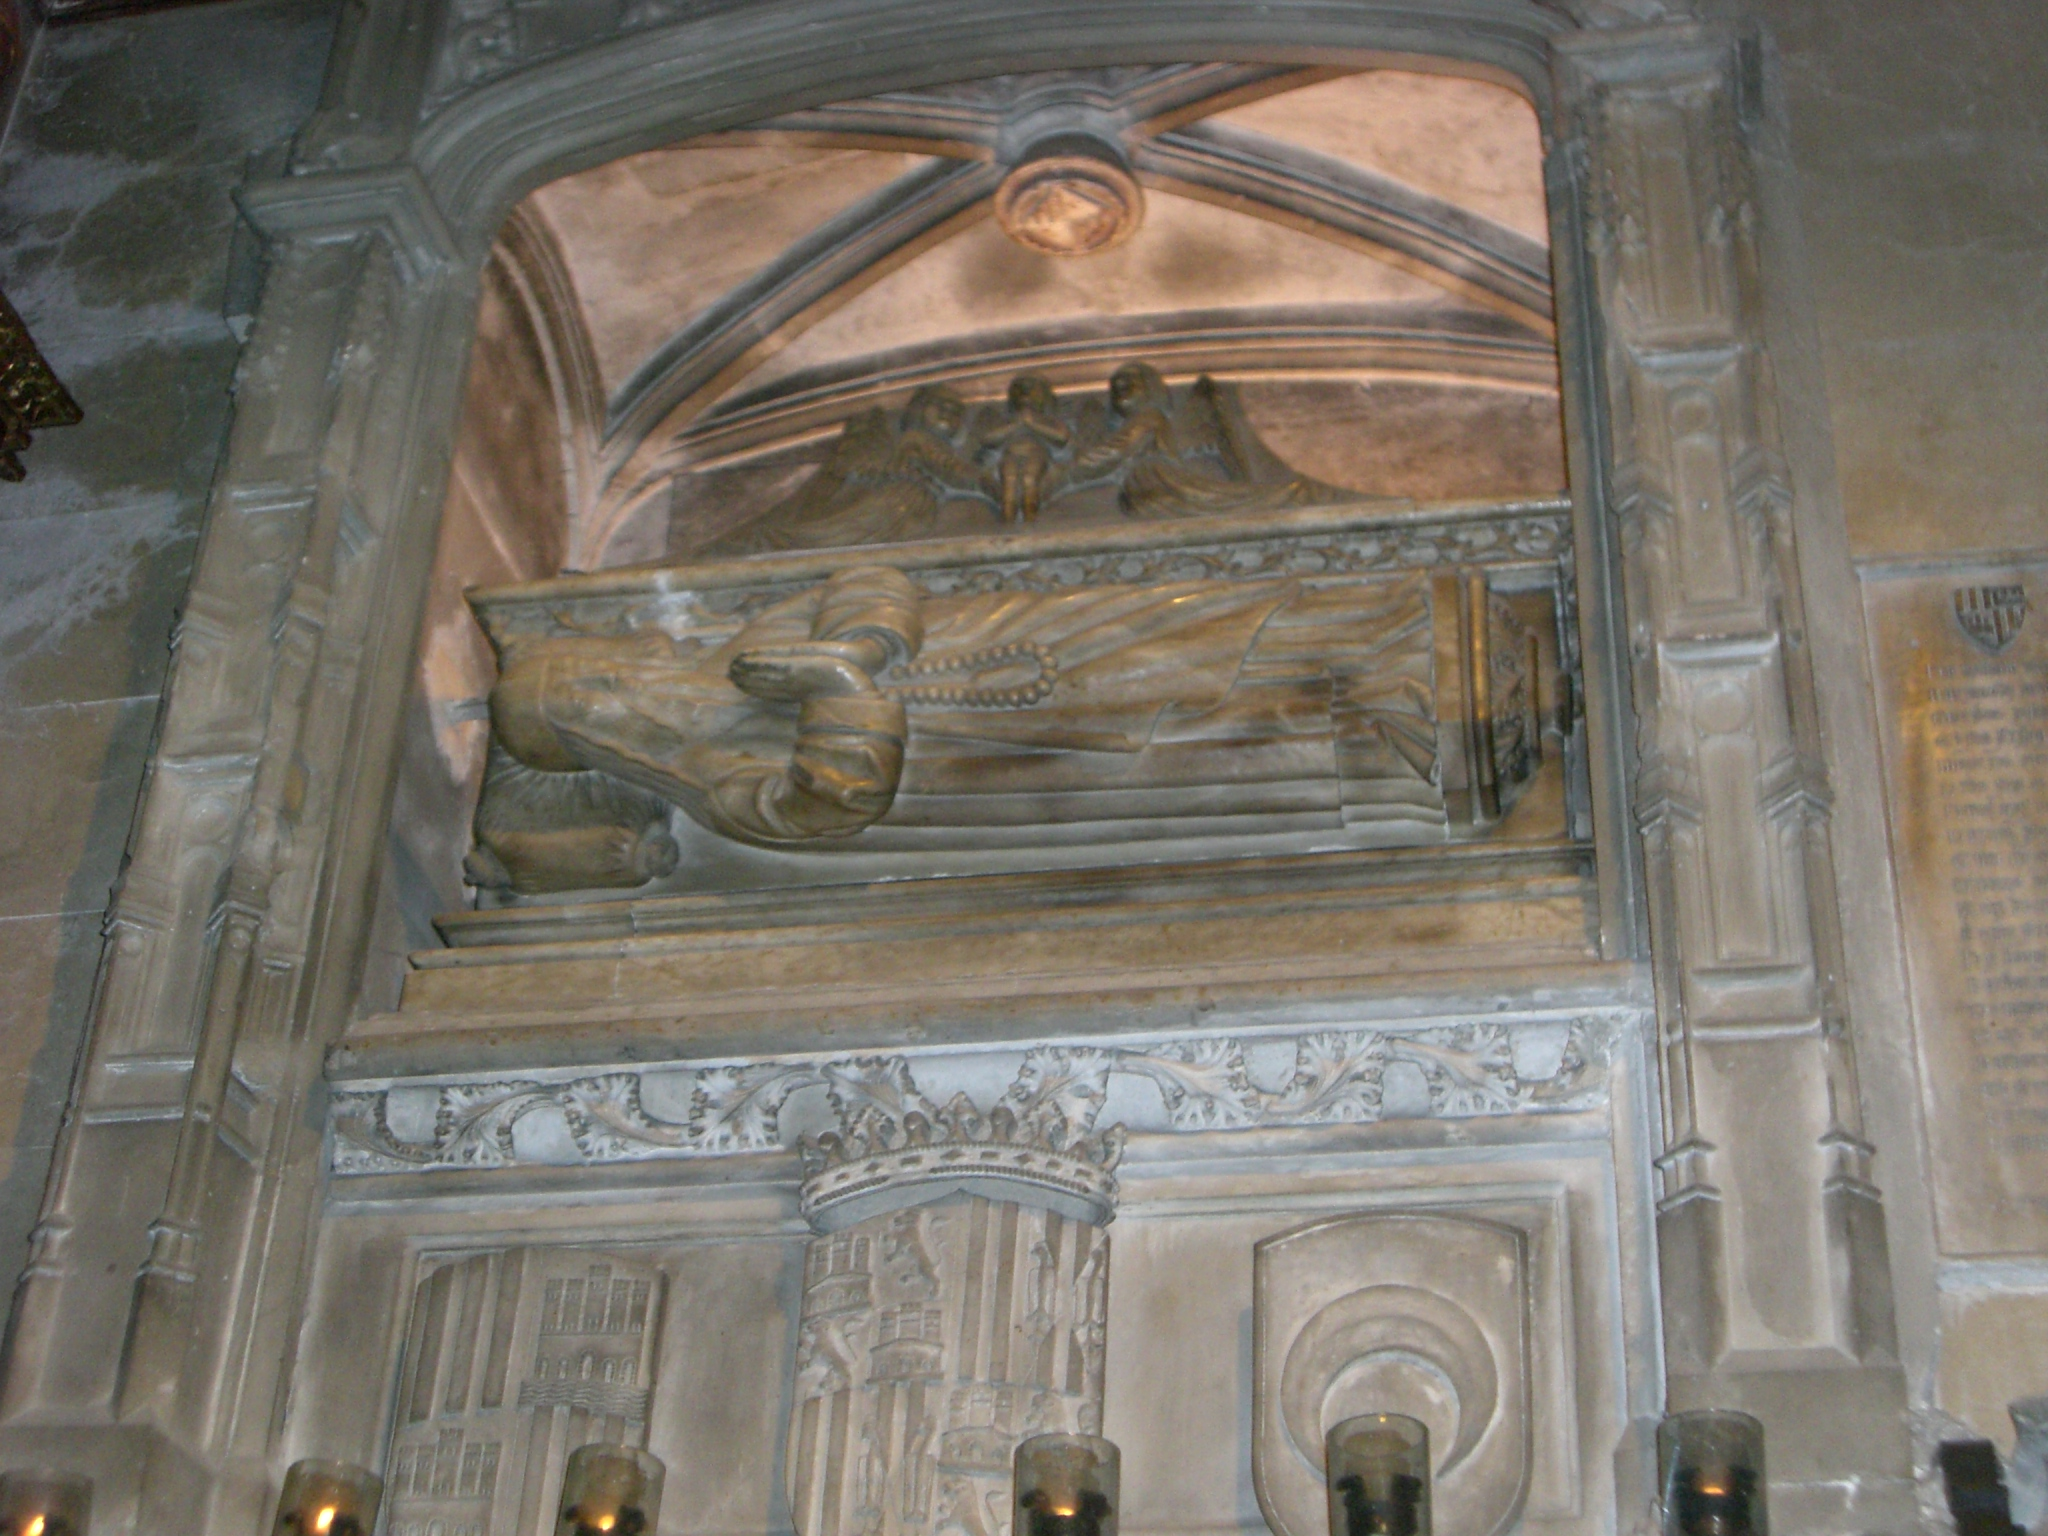 Sepulcro de Ramon Llull en el convento de San Francisco (Palma de Mallorca).